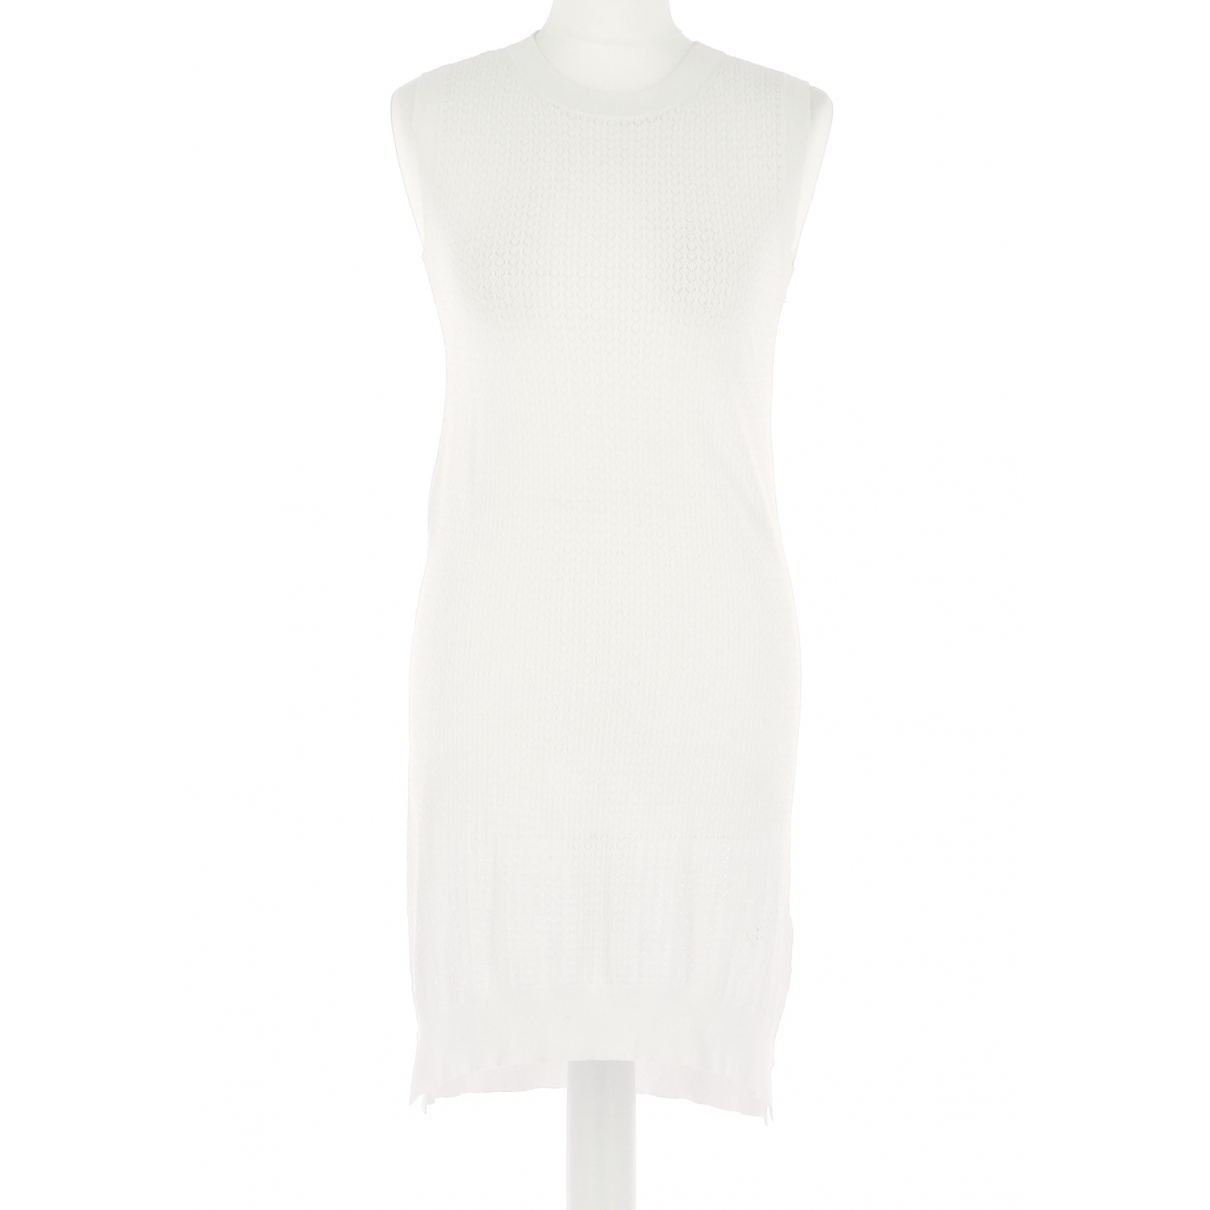 Zadig & Voltaire N White dress for Women 38 FR